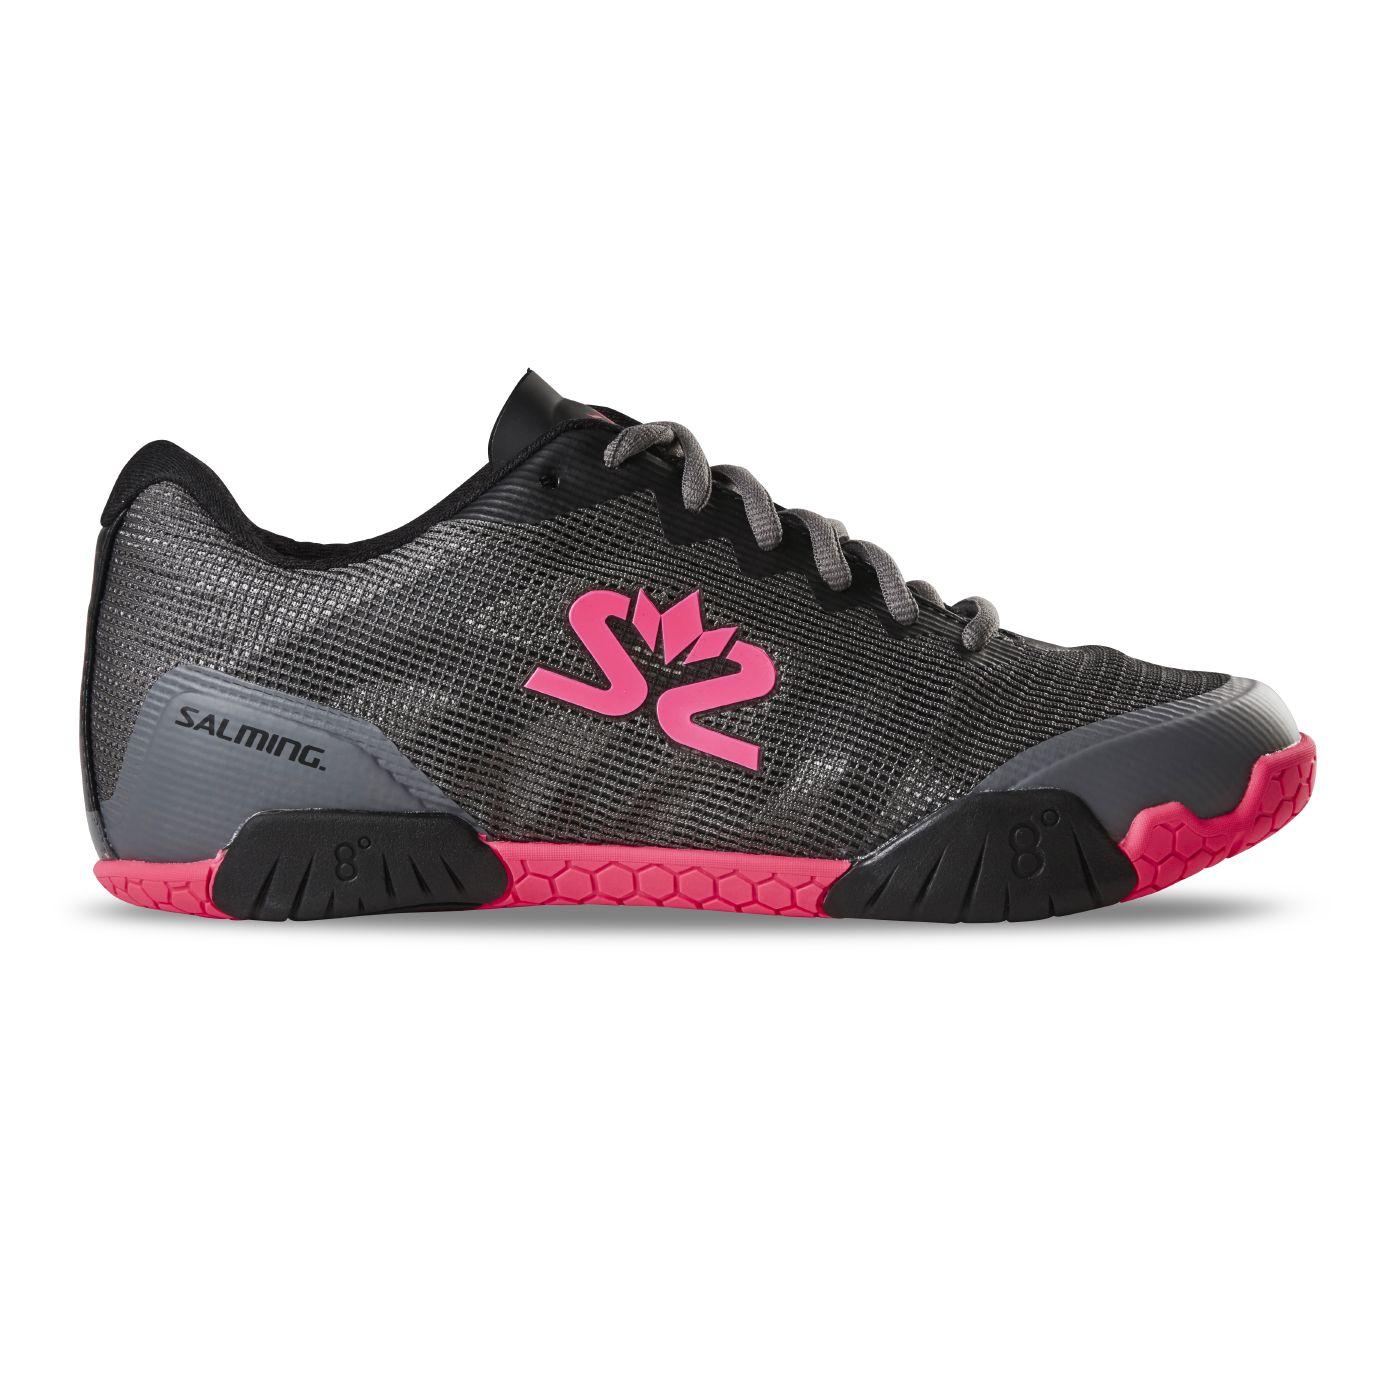 Salming Hawk Shoe Women GunMetal/Pink 6,5 UK - 40 EUR - 25,5 cm